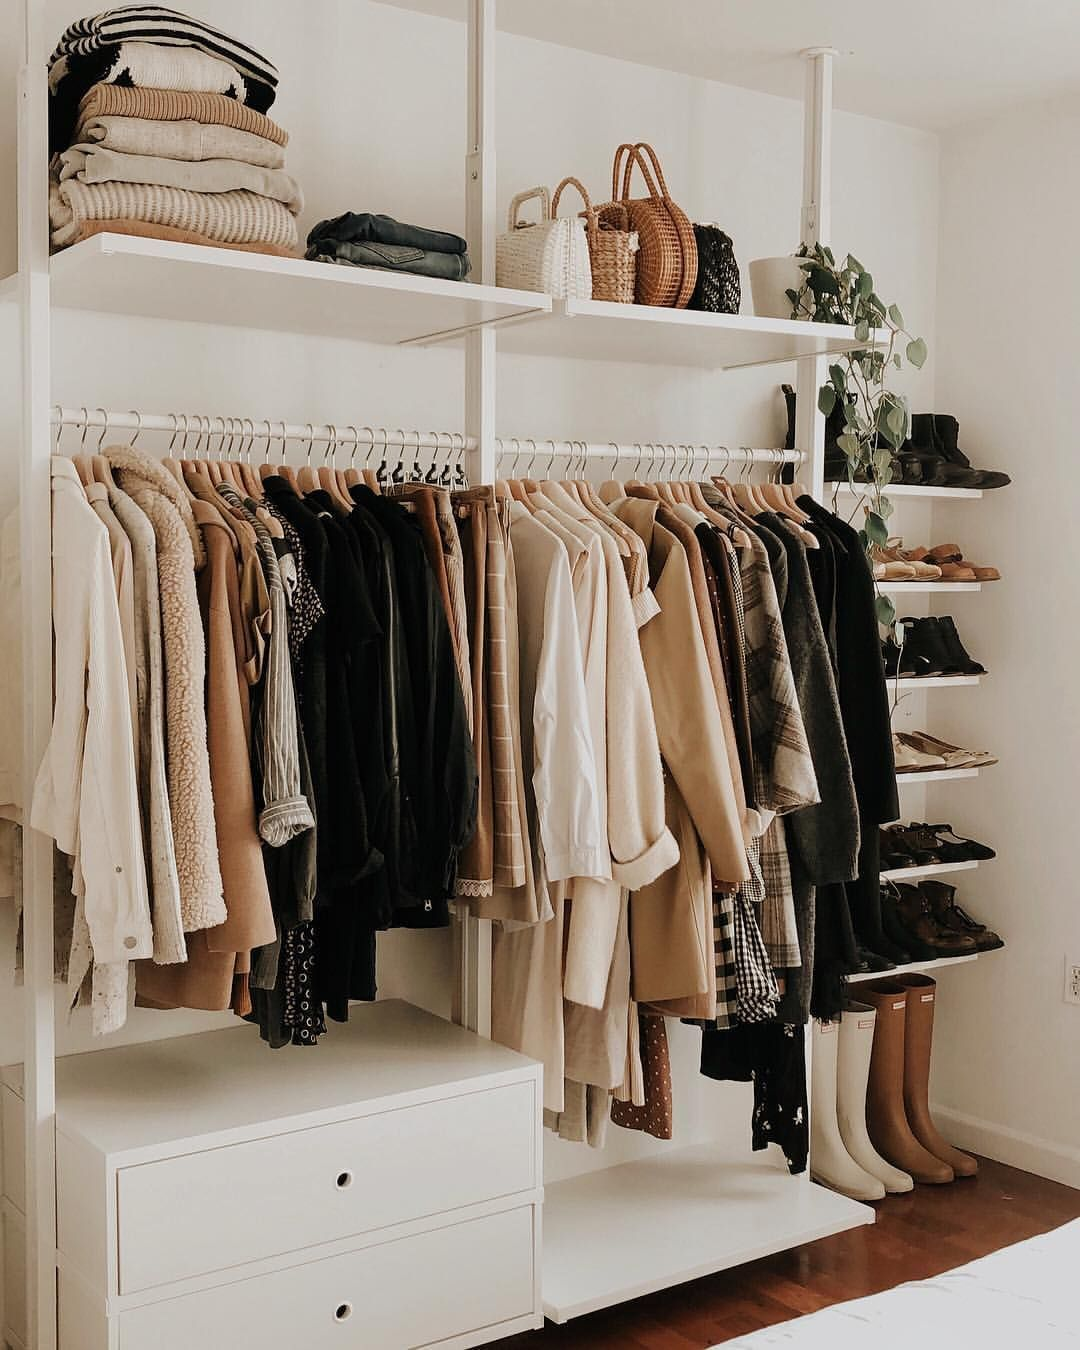 Ashley Ballard On Instagram Still So Thrilled With My New Closet